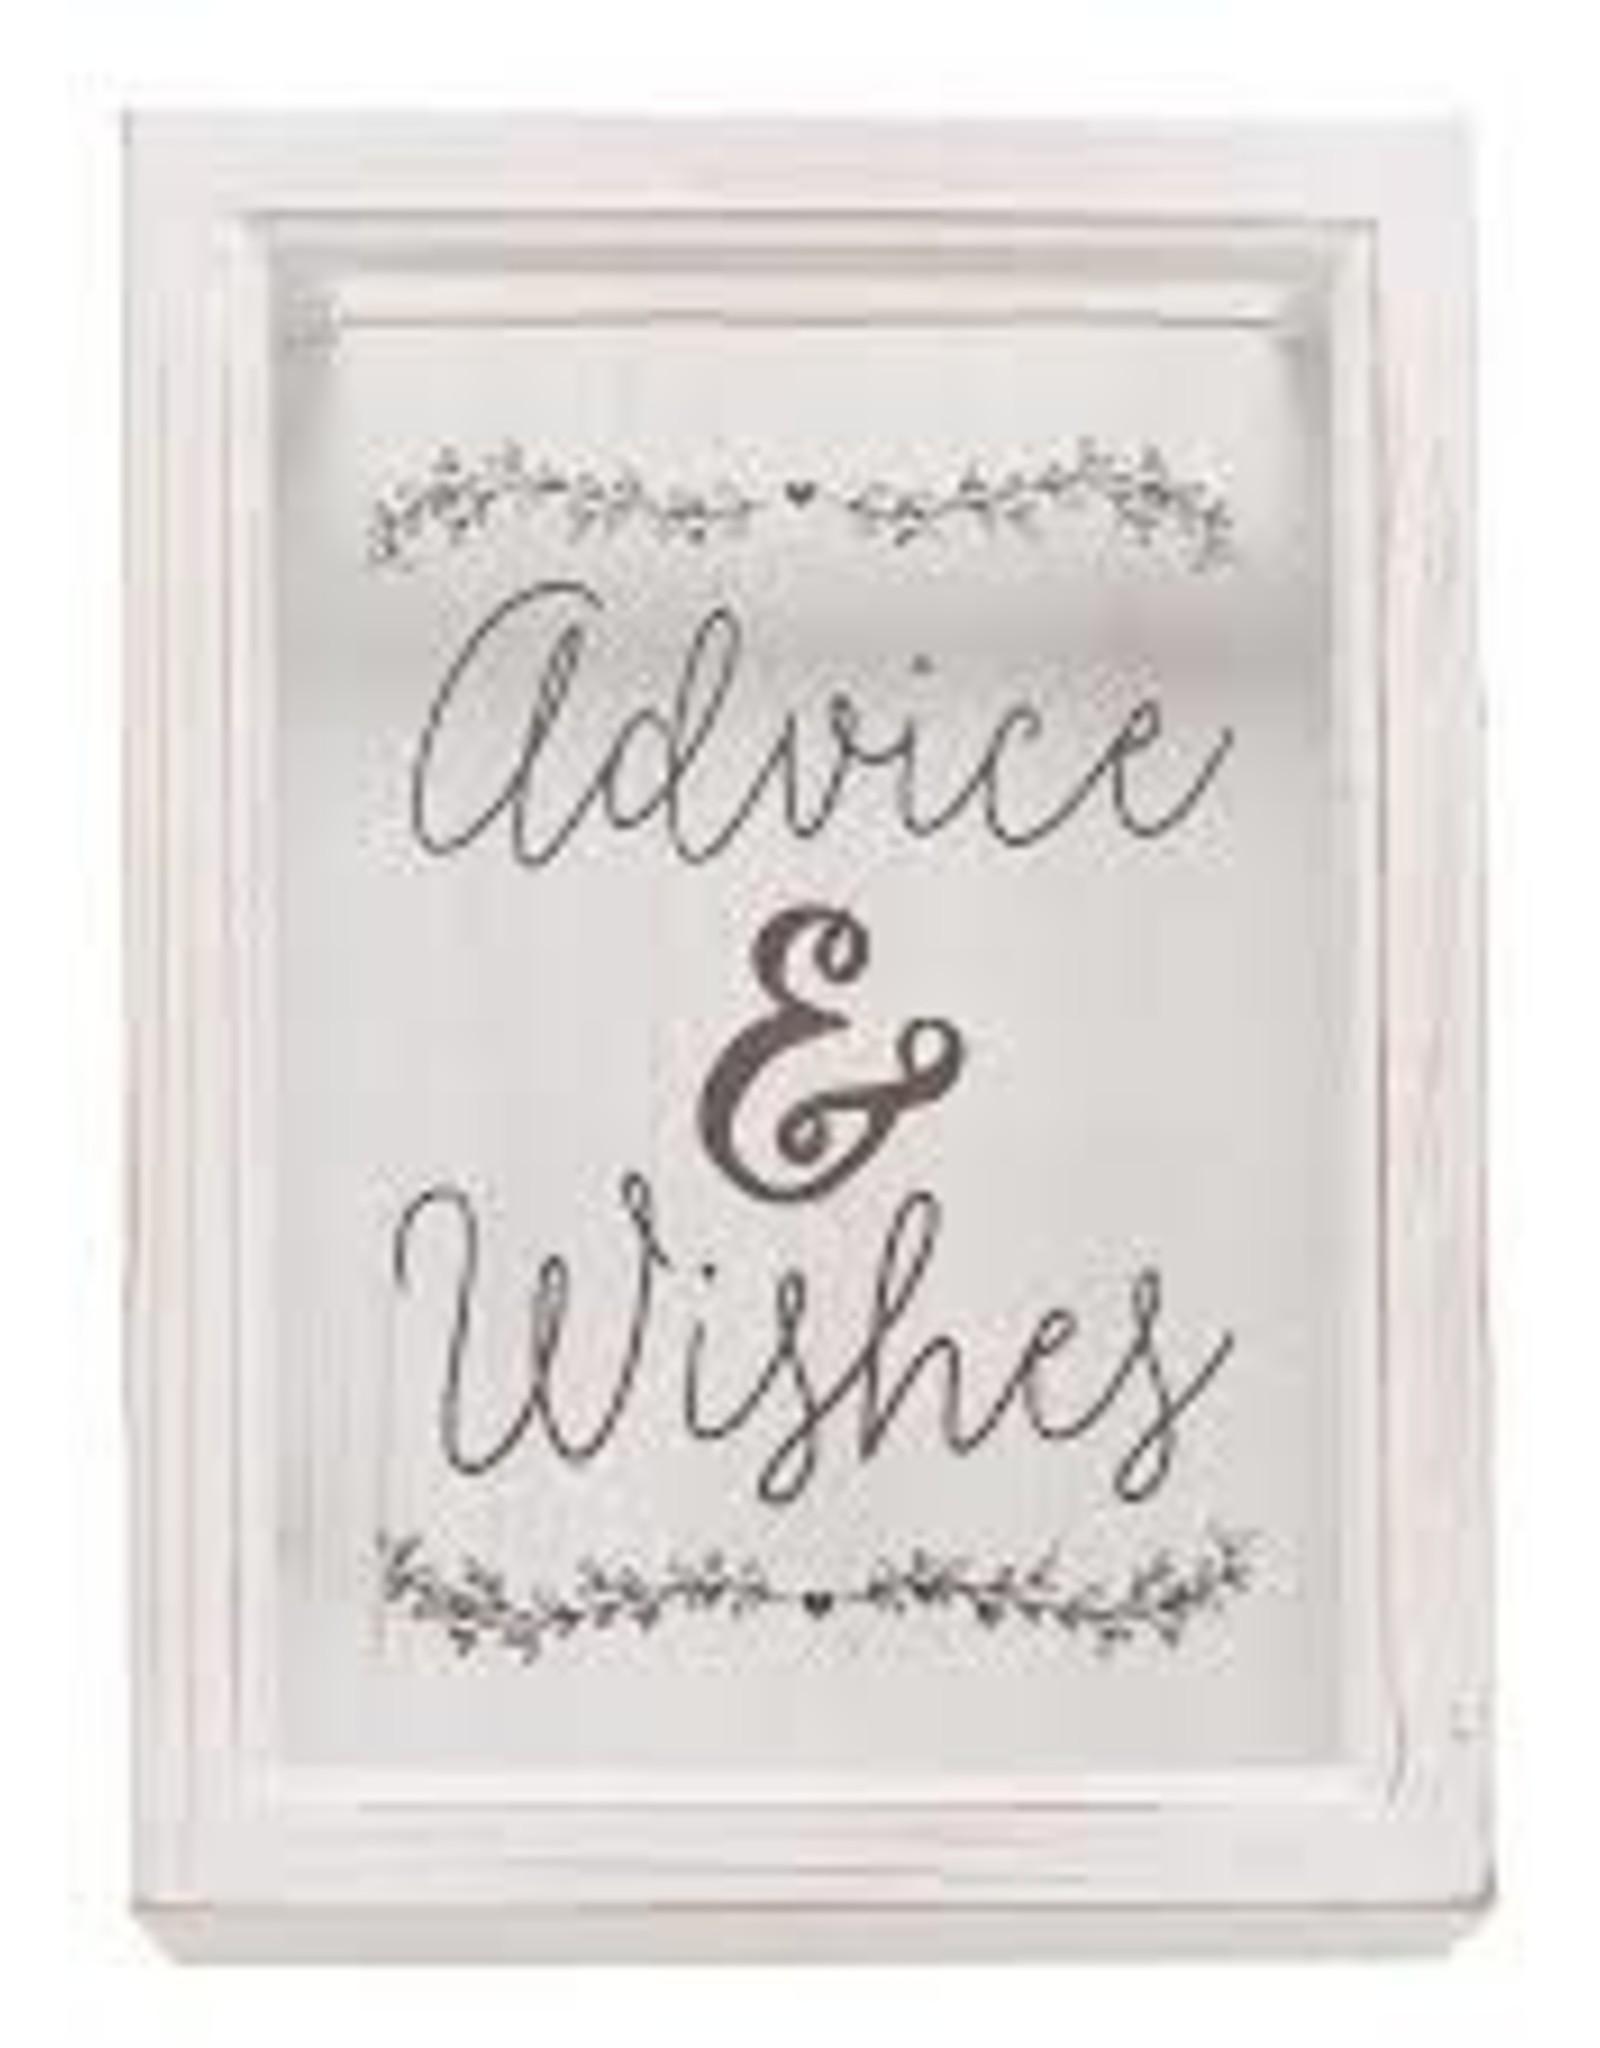 Advice & Wishes Keepsake Box